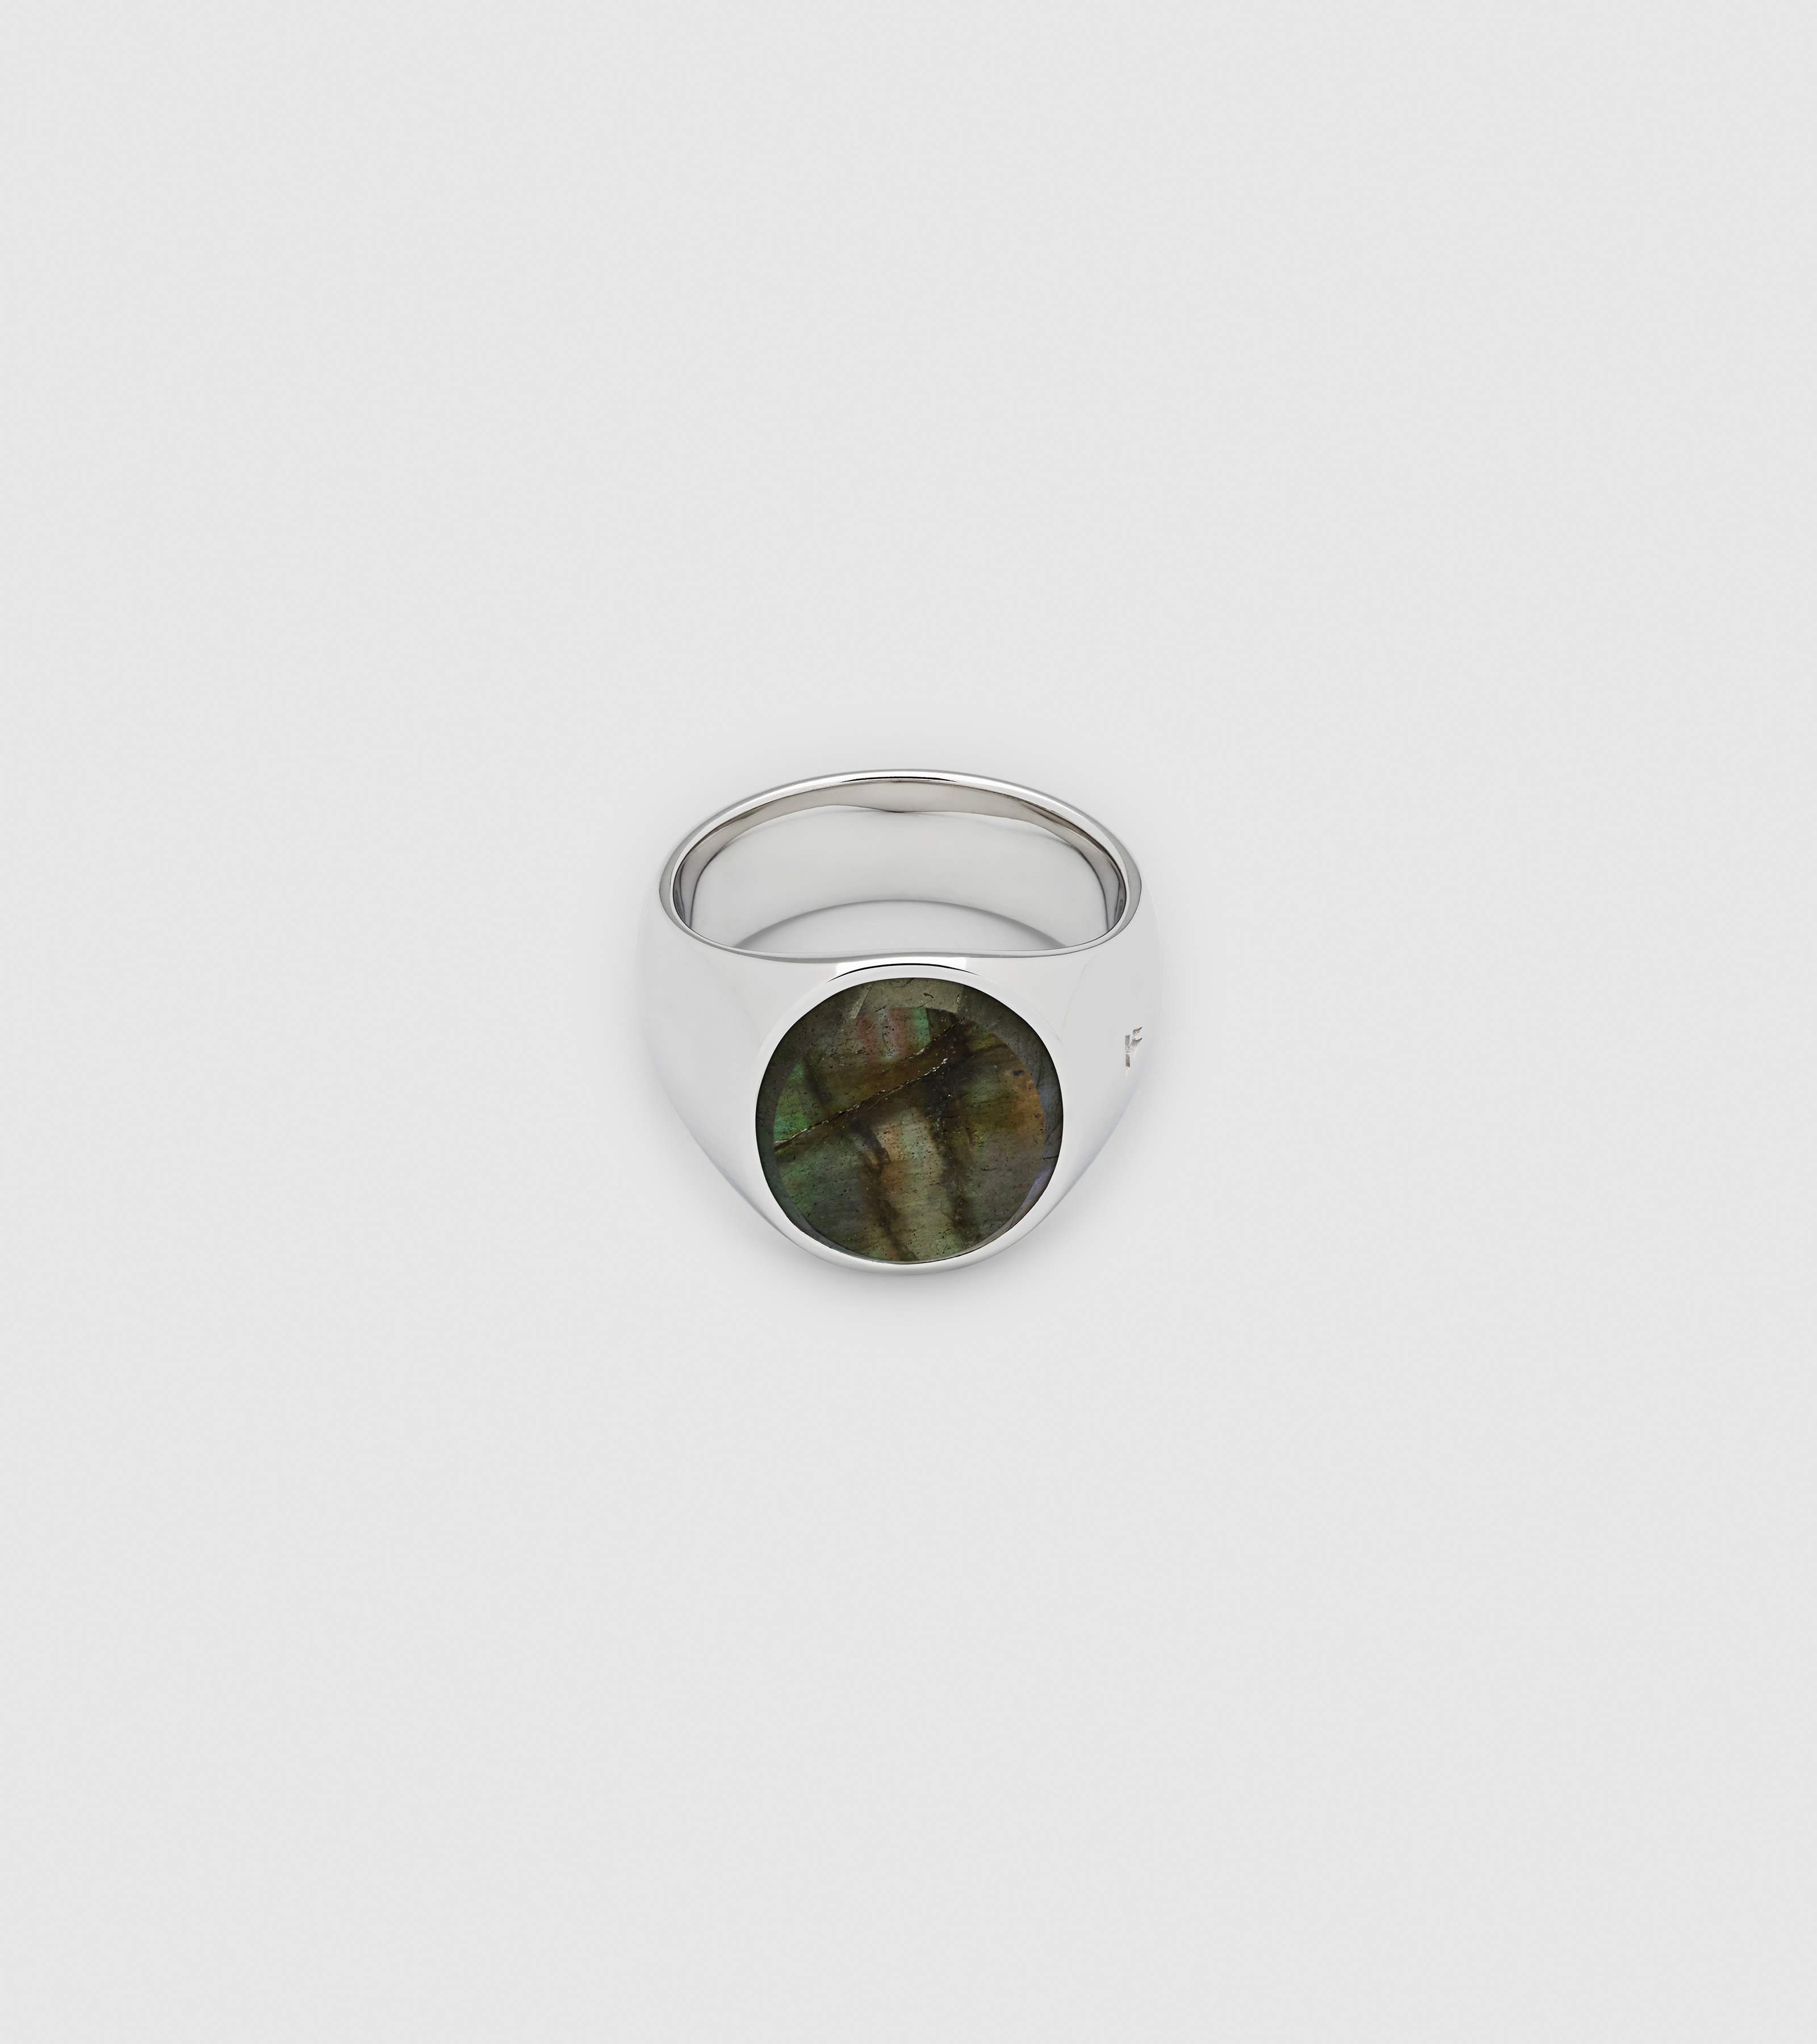 Oval Labradorite